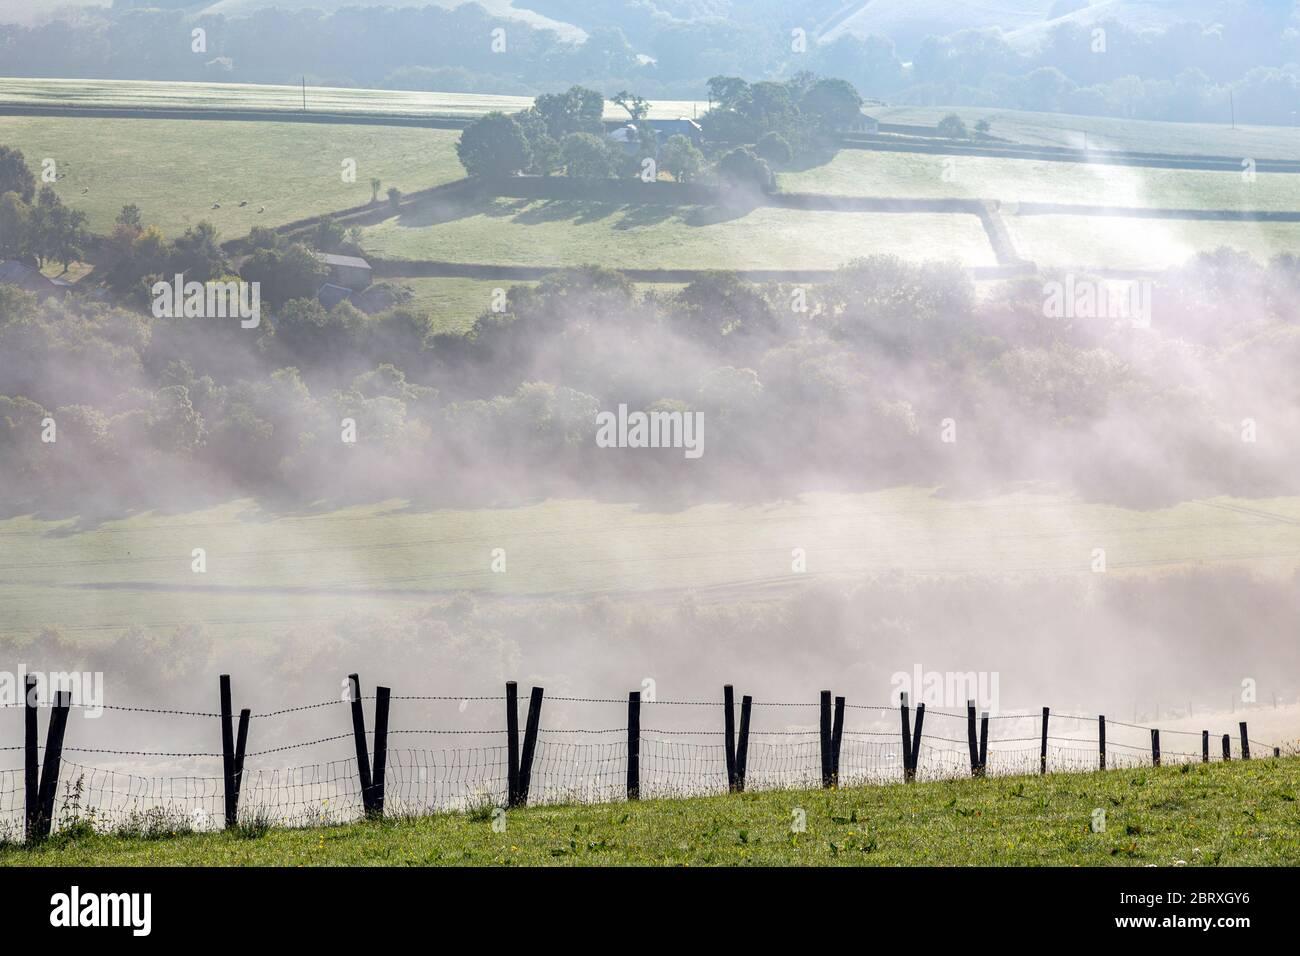 teign Valley, nebbia nella valle del teign Dartmoor ambiente, conservazione ambientale, questioni ambientali, Eternity, Foresta, come Away, Tree, UK Foto Stock